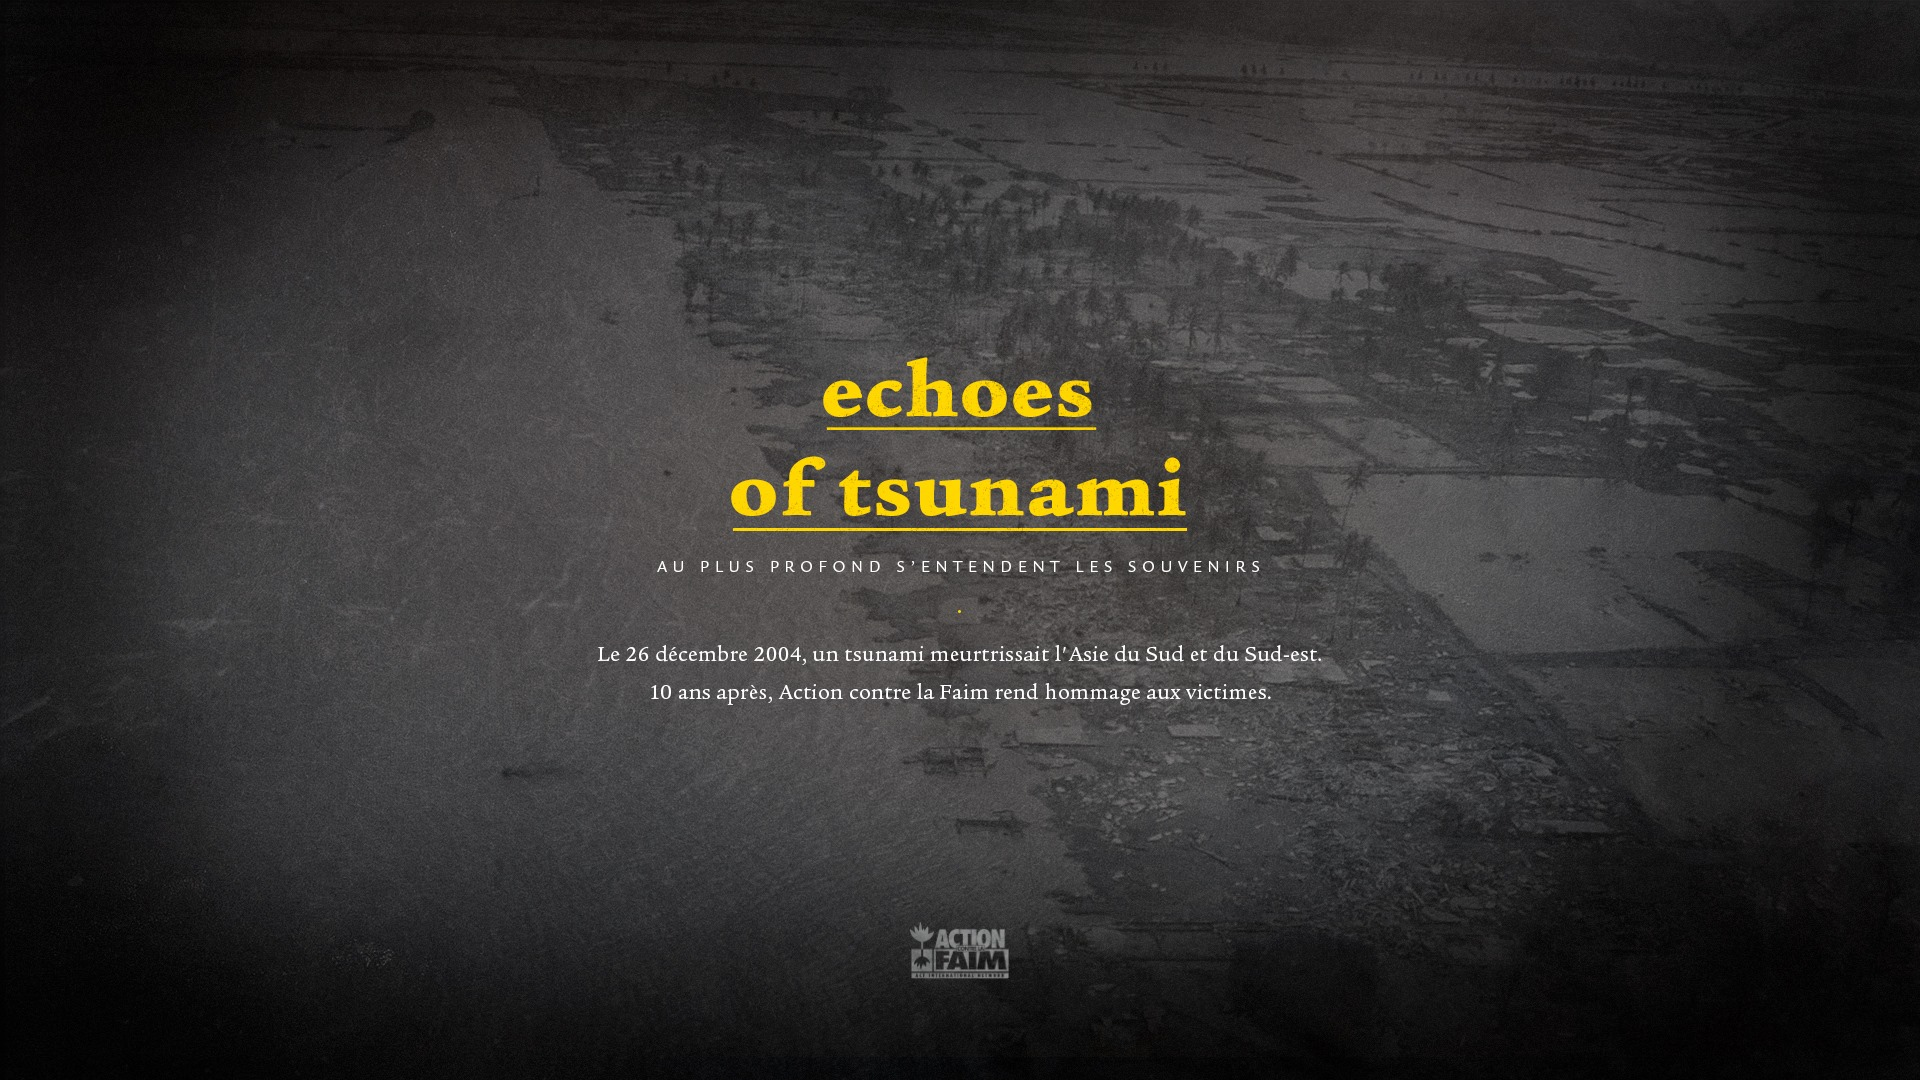 Echoes Of Tsunami